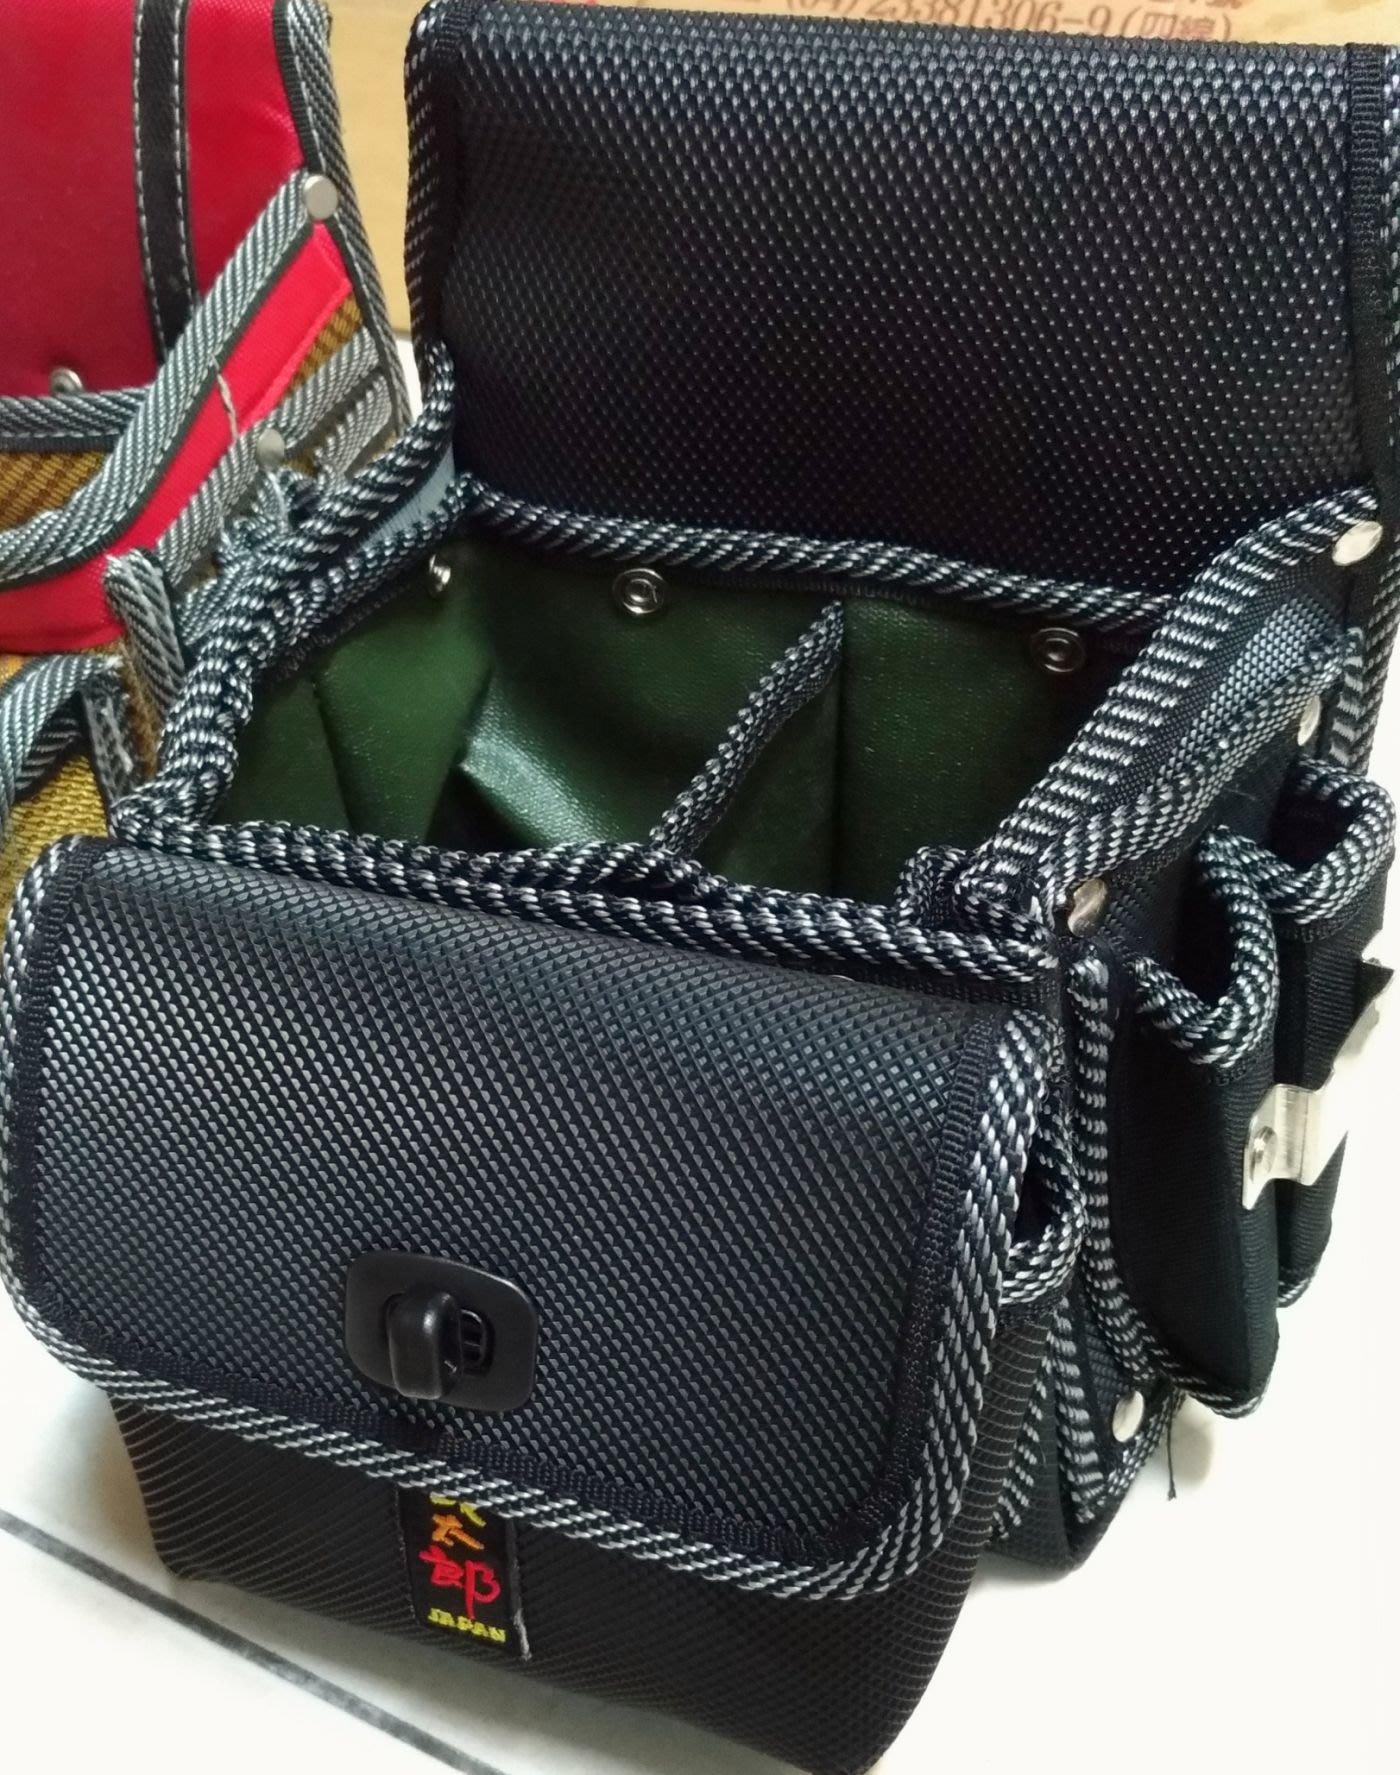 [CK五金小舖] 茂太郎 雙孔釘袋 工具包 工具袋 TY-52